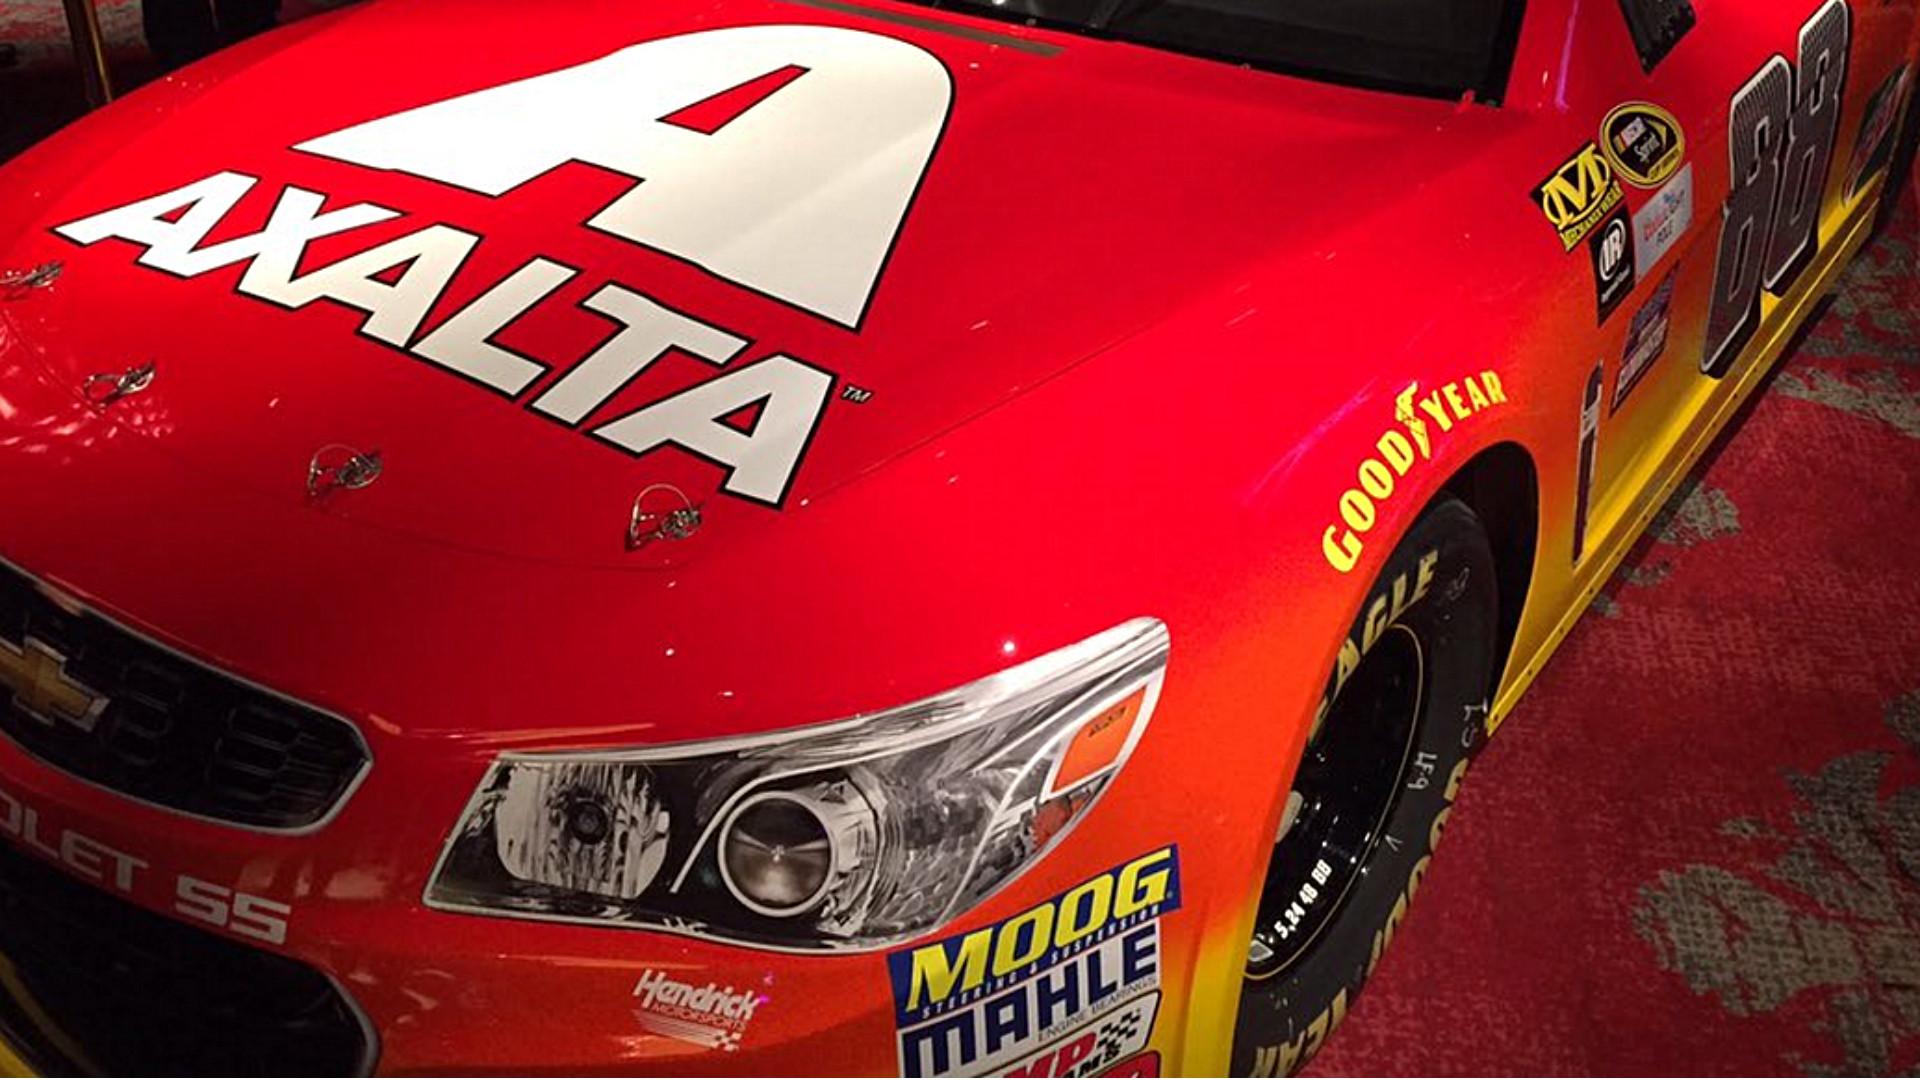 Dale Earnhardt Jr.'s car to have 'Solar Flare' paint scheme for Phoenix    NASCAR   Sporting News